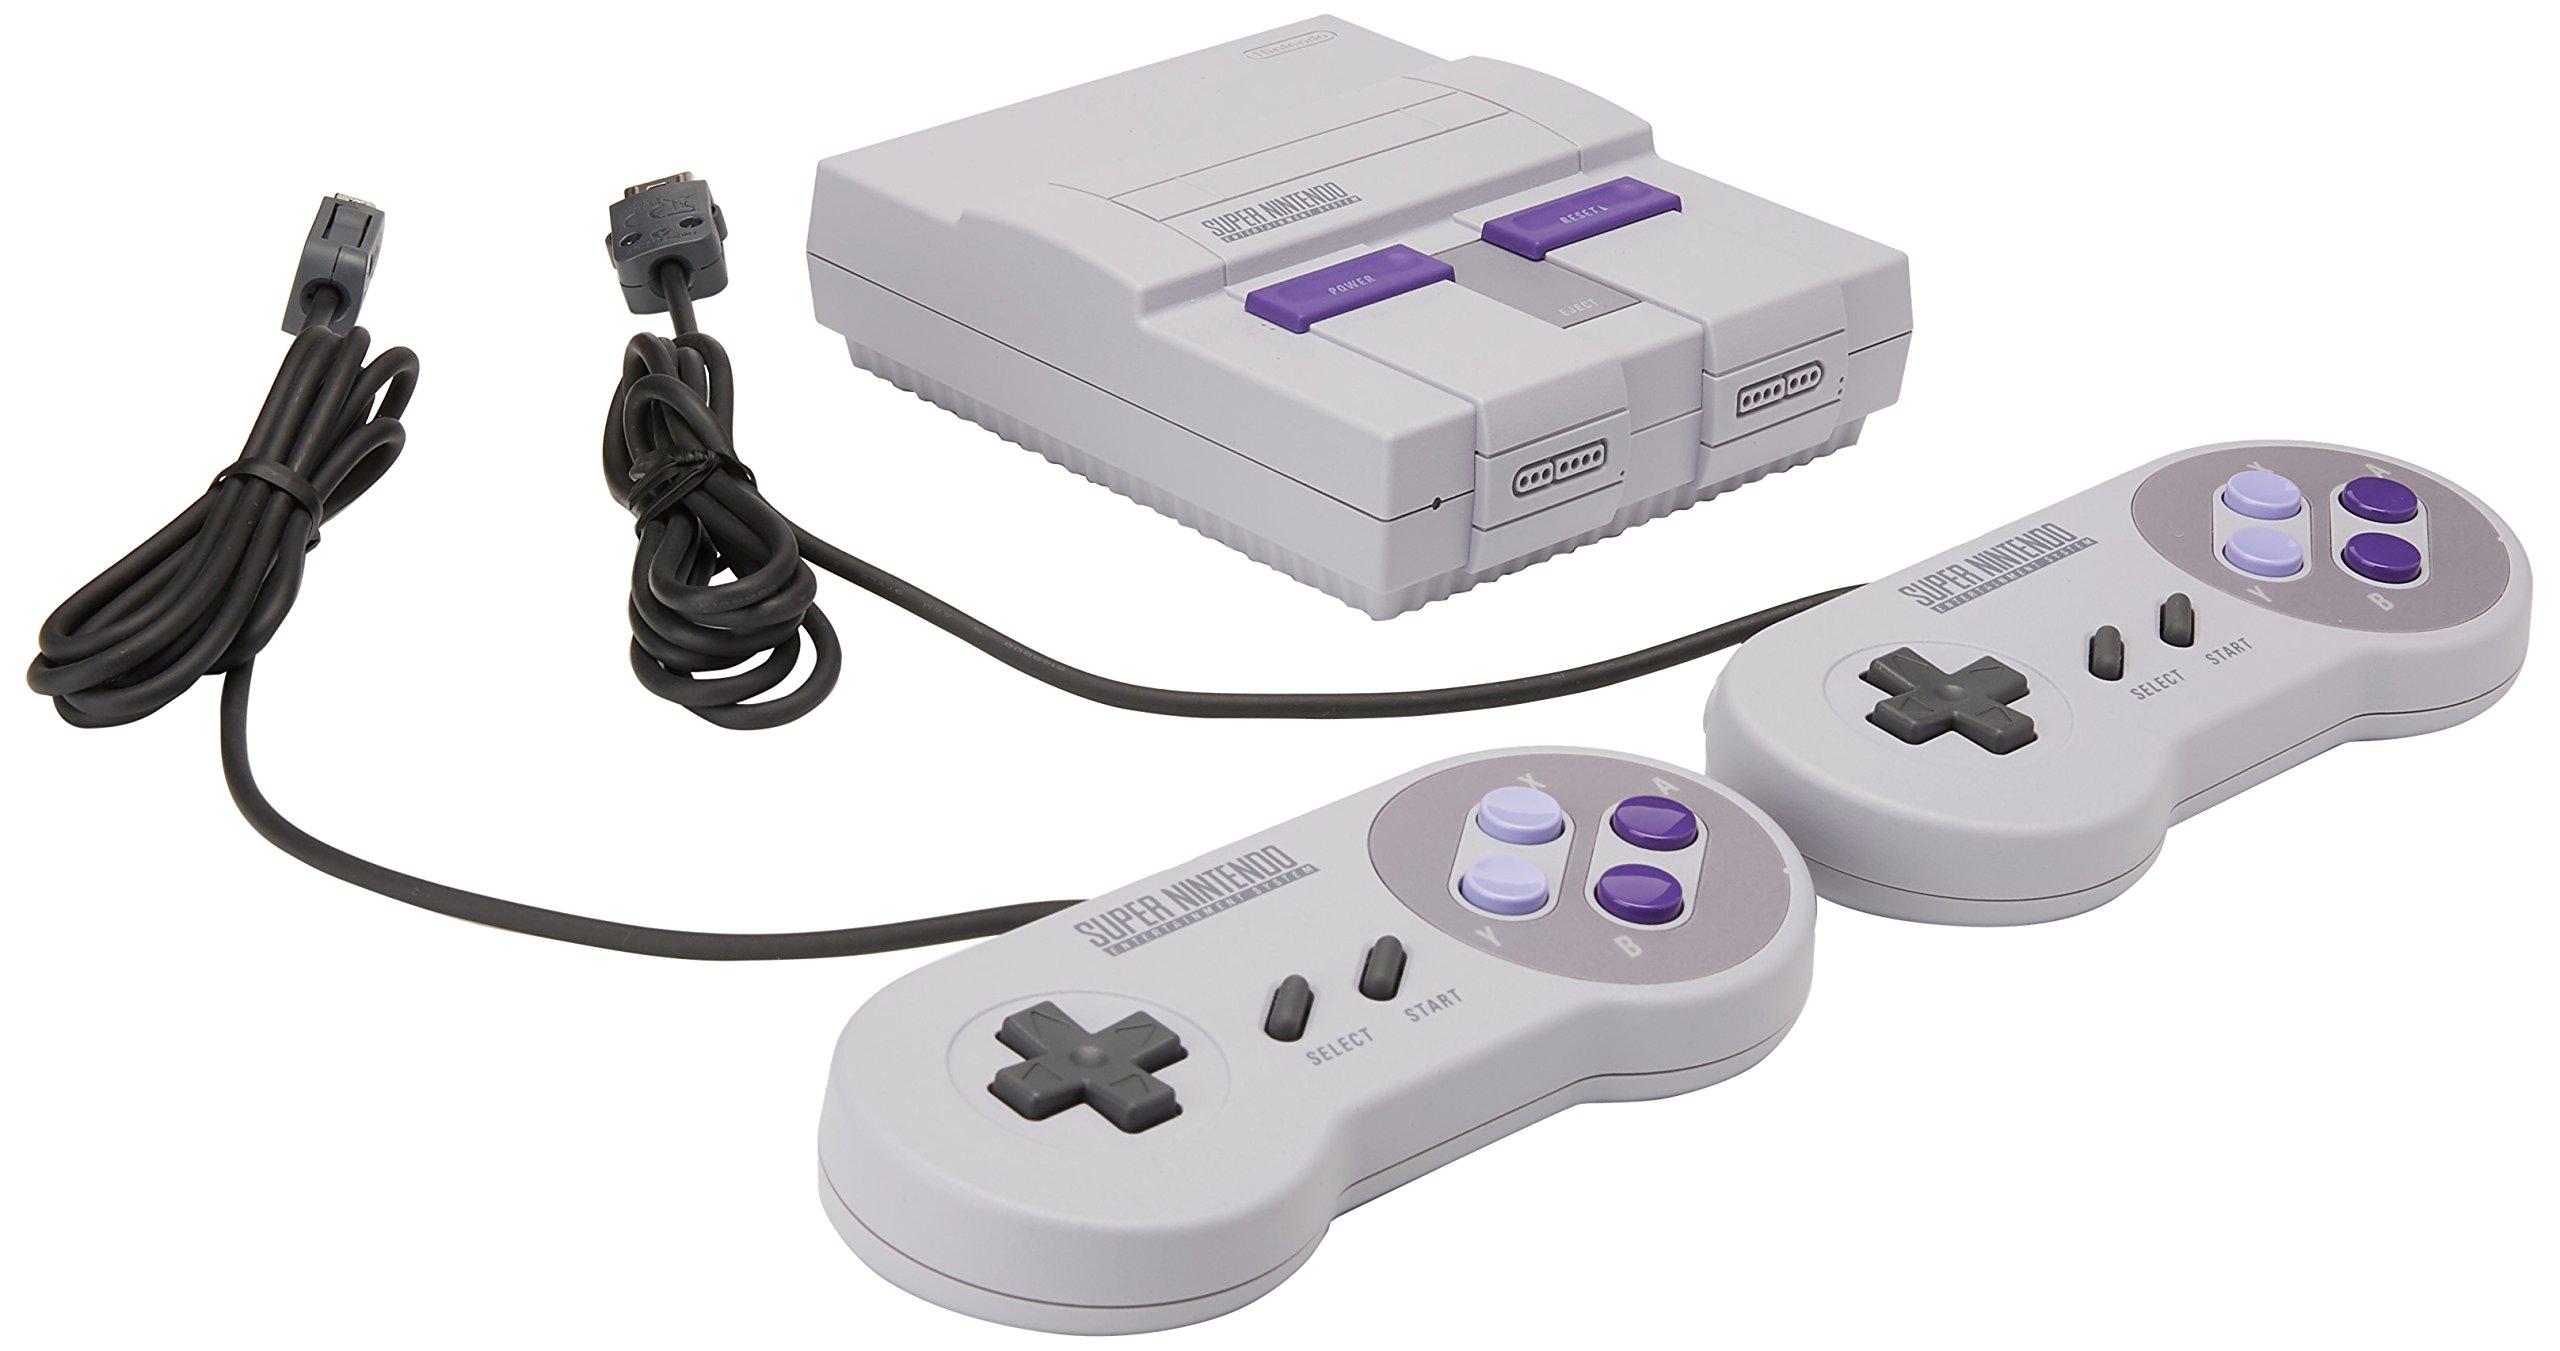 Super NES Classic Edition product image